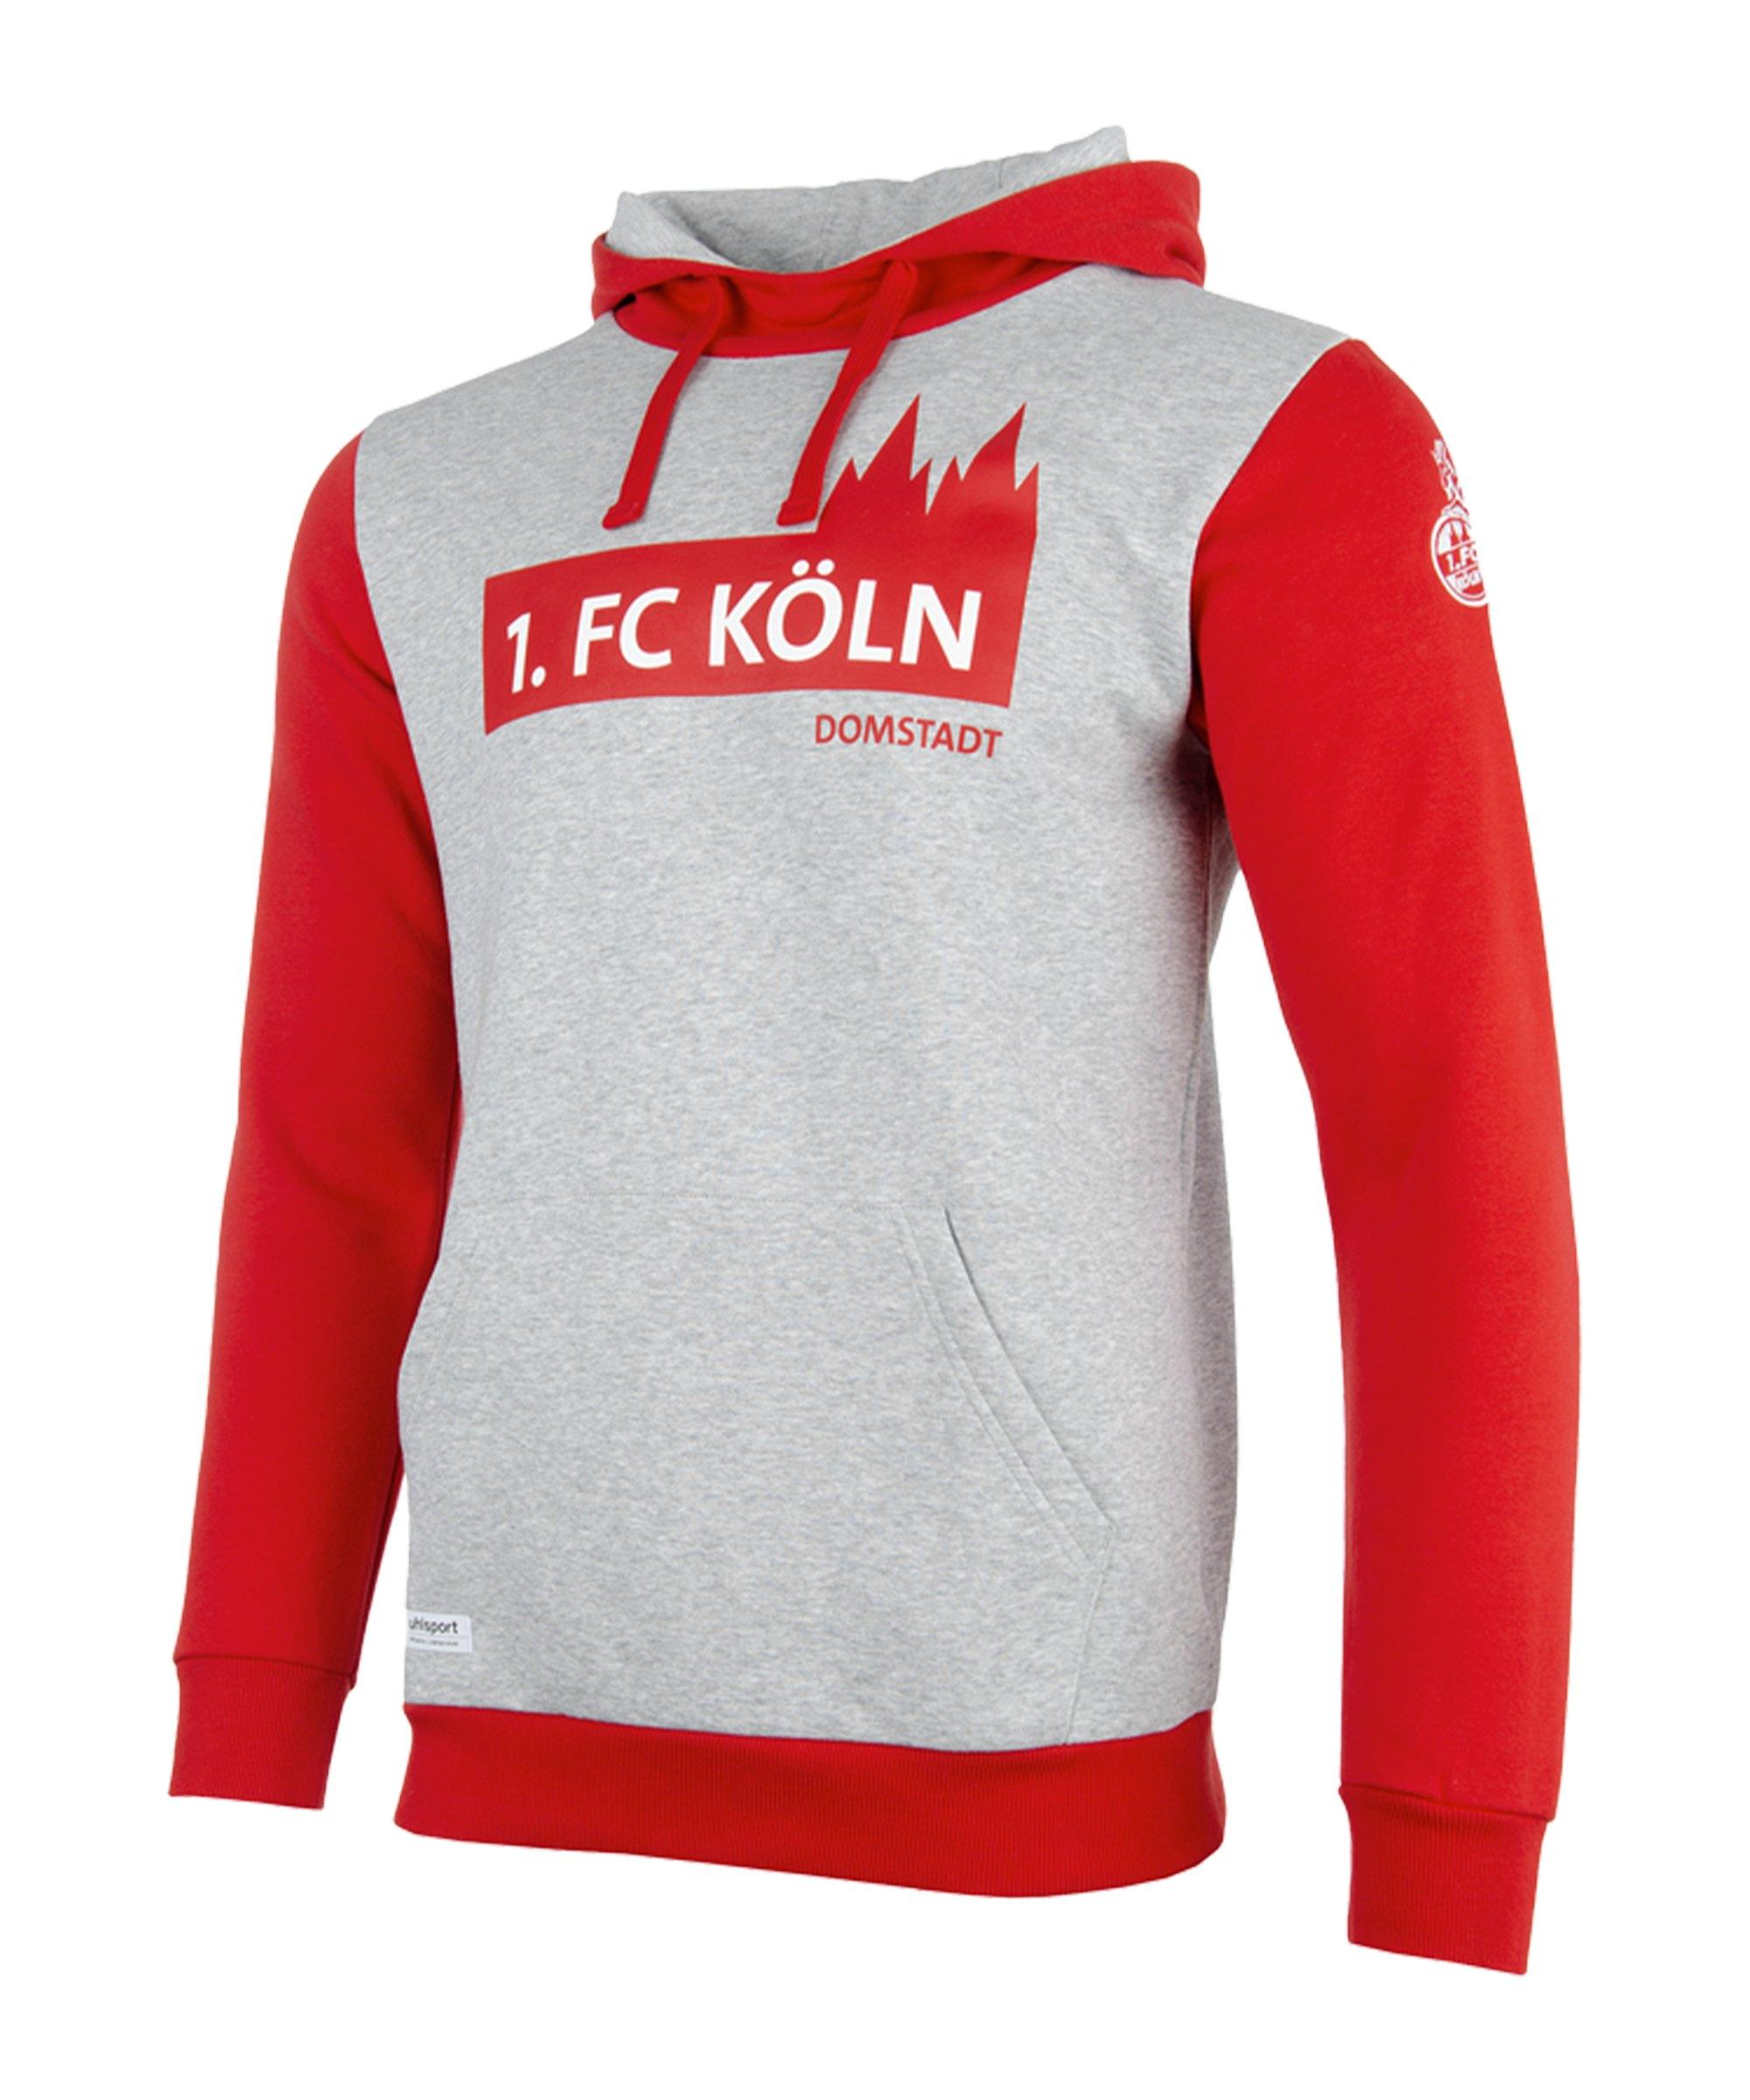 Uhlsport 1. FC Köln 3.0 Hoody Grau Rot - grau